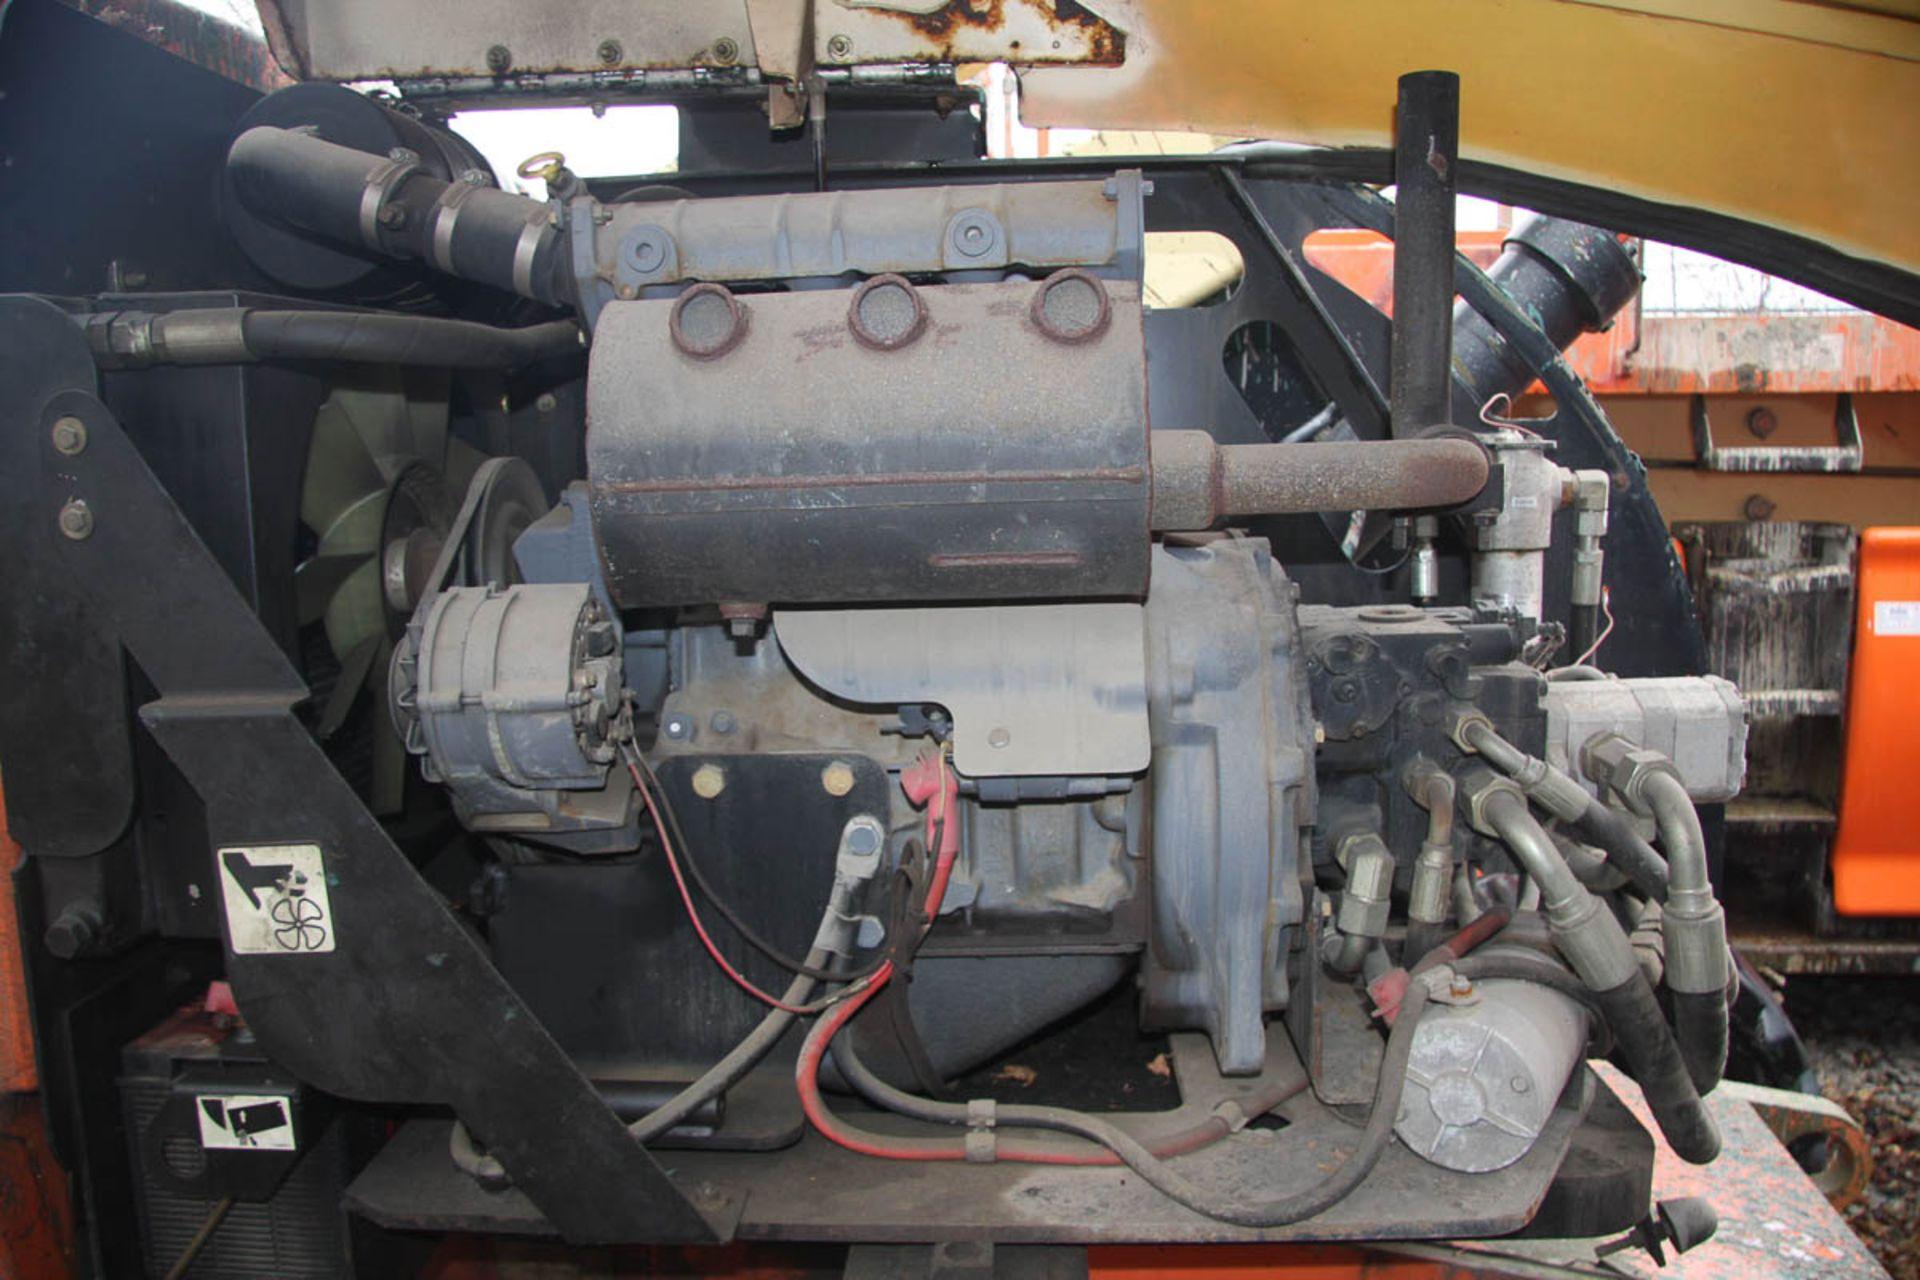 2002 JLG 450AJ SEIRES II BOOM LIFT, DIESEL, WITH 45' MAX HEIGHT, 500# CAPACITY, 24' HORIZONTAL - Image 3 of 9